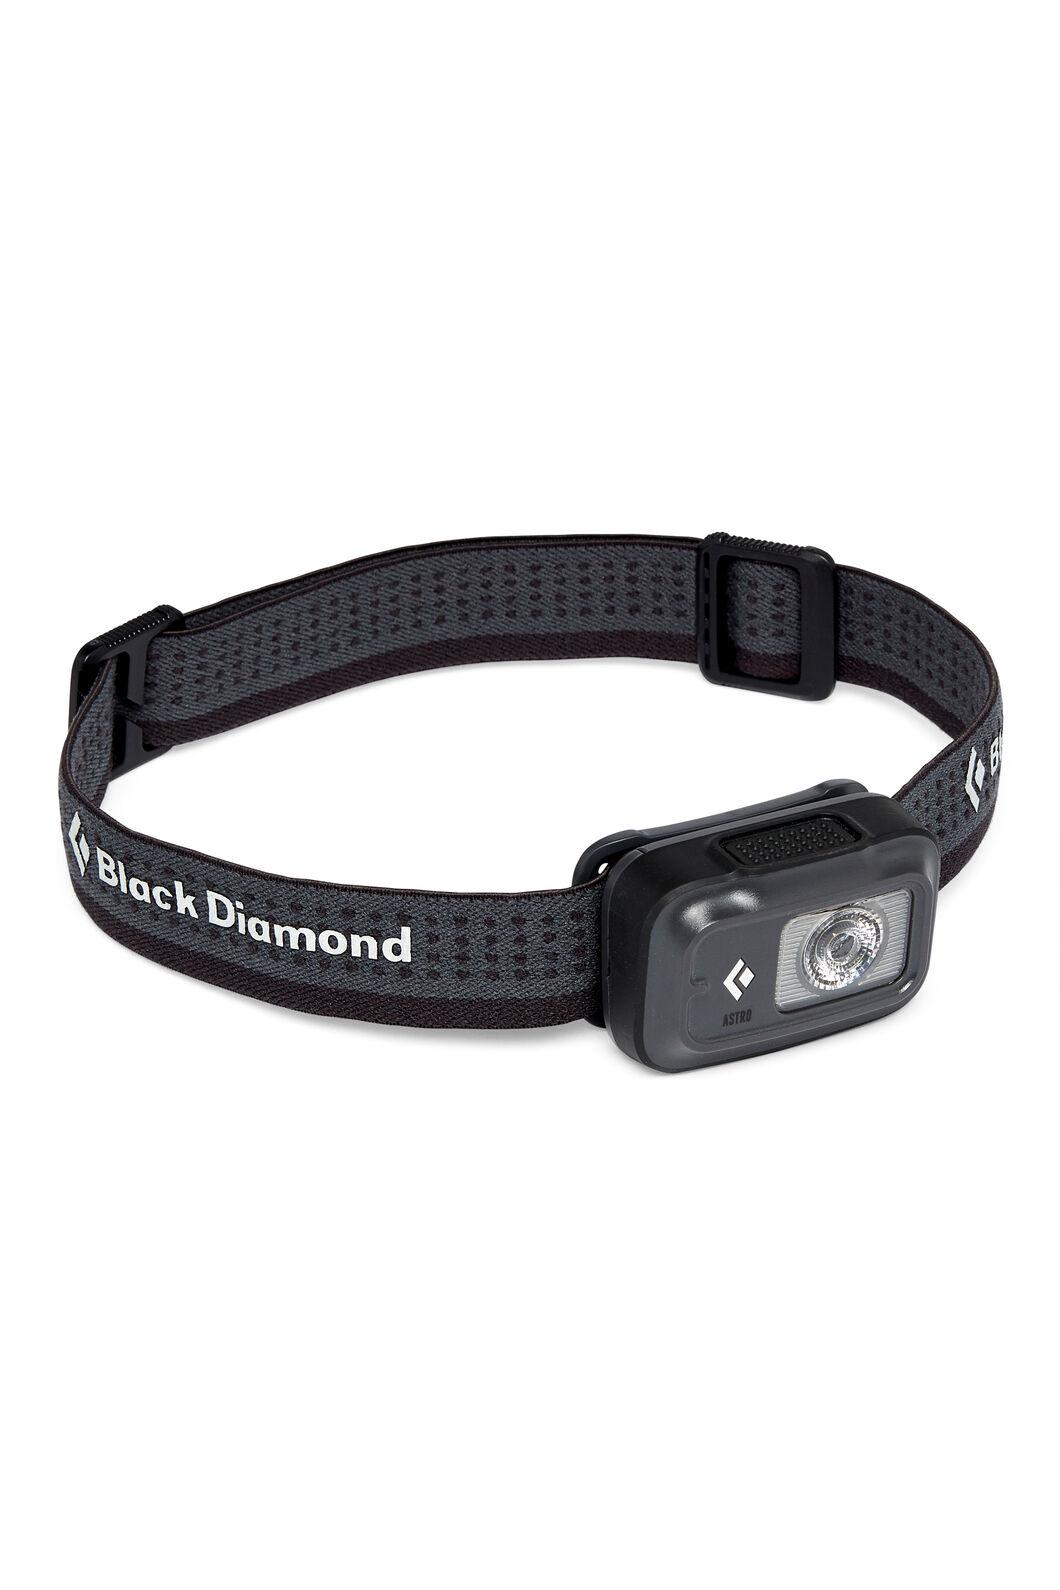 Black Diamond Astro 250 Headlamp, Graphite, hi-res